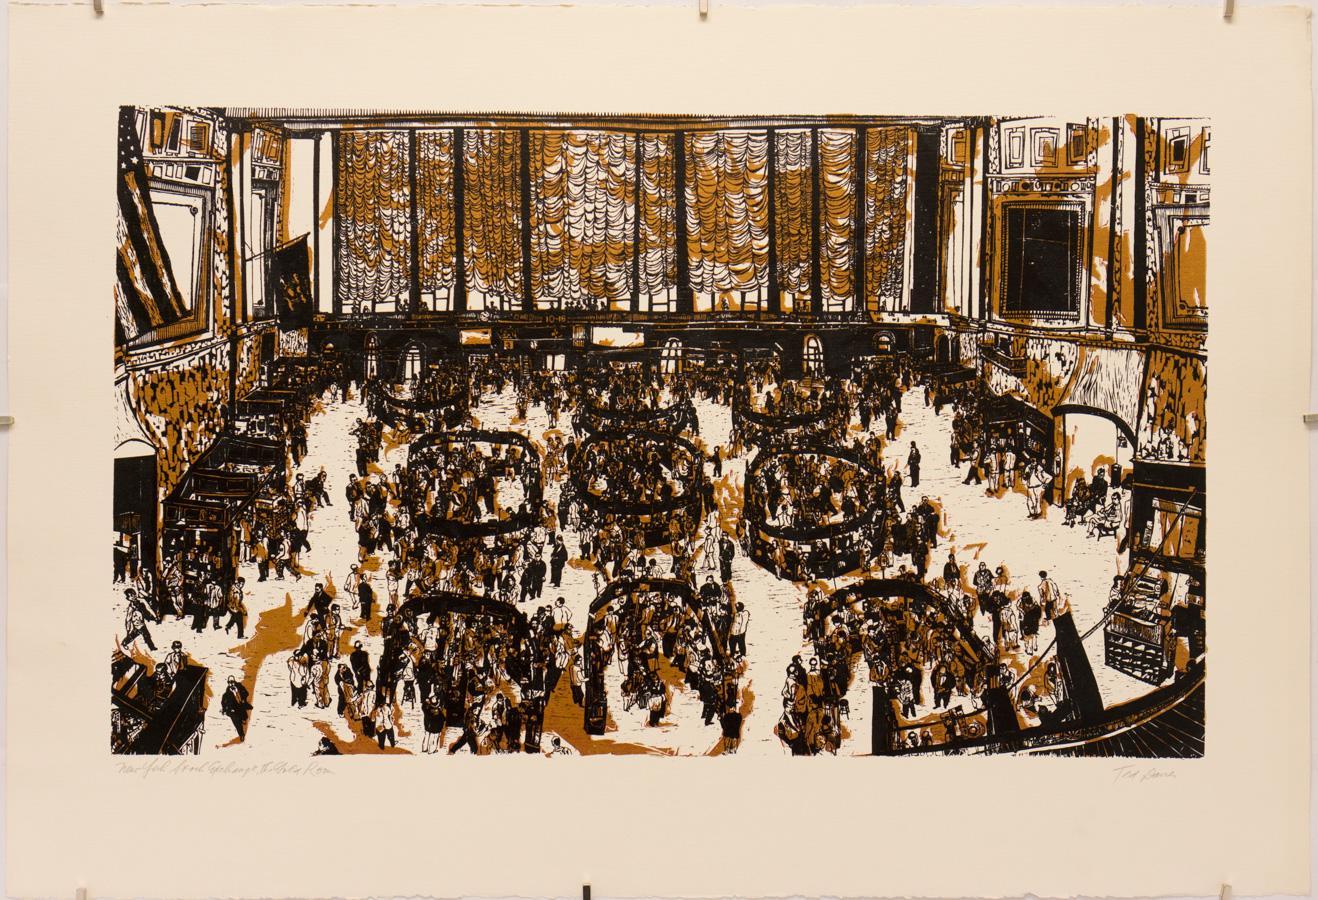 New York Stock Exchange, the Gold Room